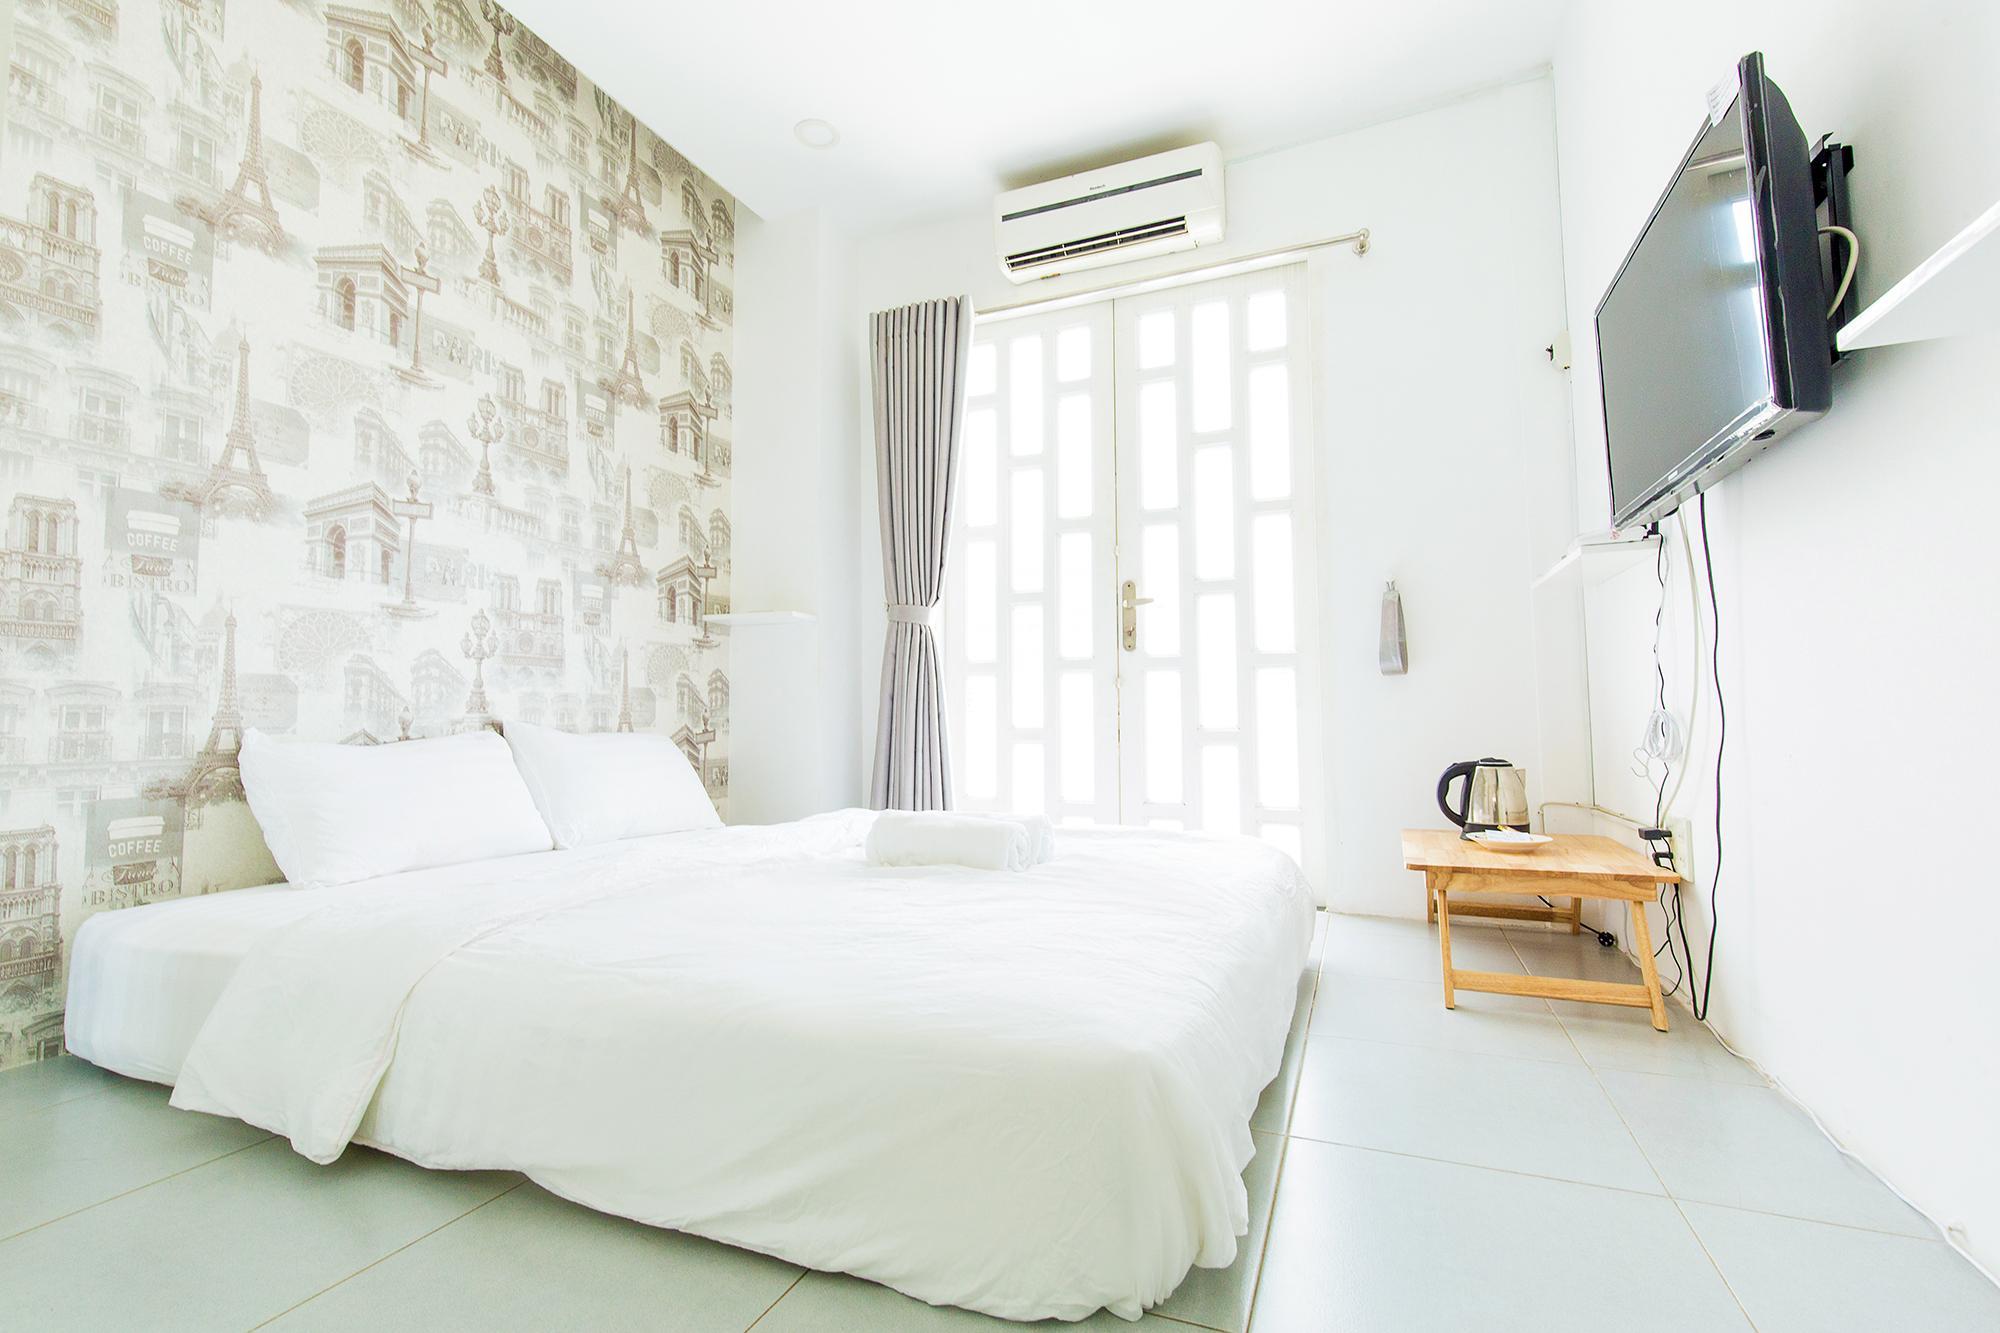 QHome Vo Van Tan Single Room With Big Rooftop